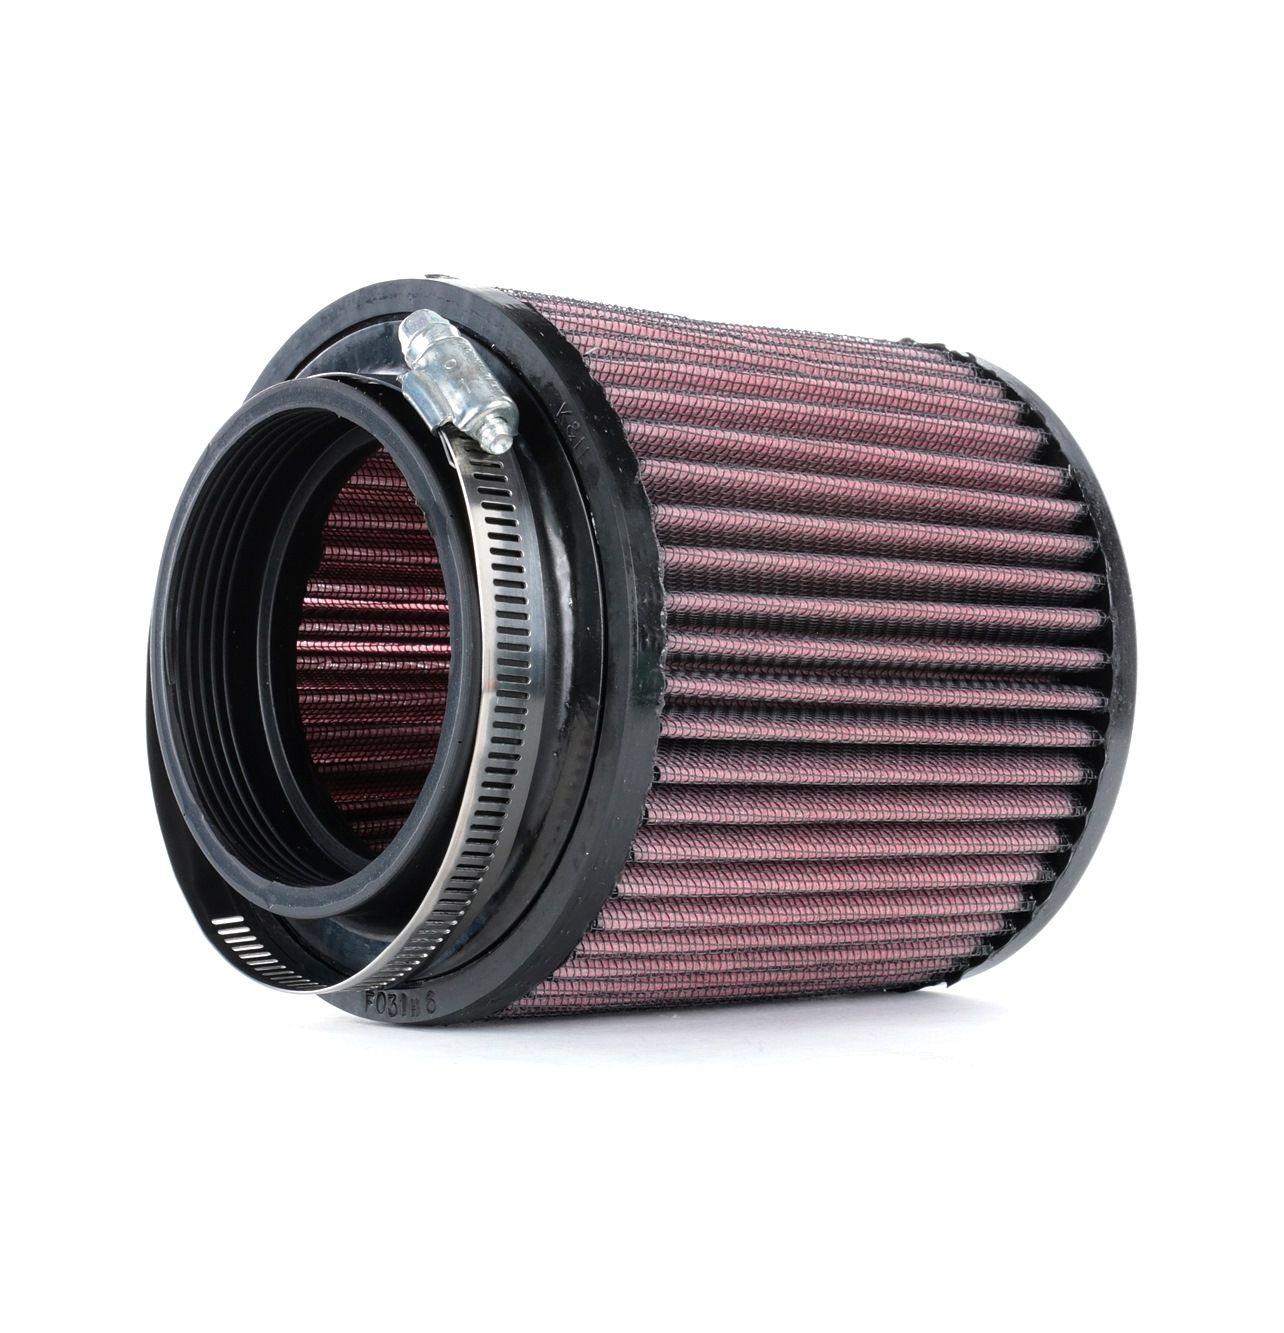 K&N Filters: Original Luftfilter E-2021 (Länge: 130mm, Länge: 130mm, Breite: 128mm, Höhe: 117mm)